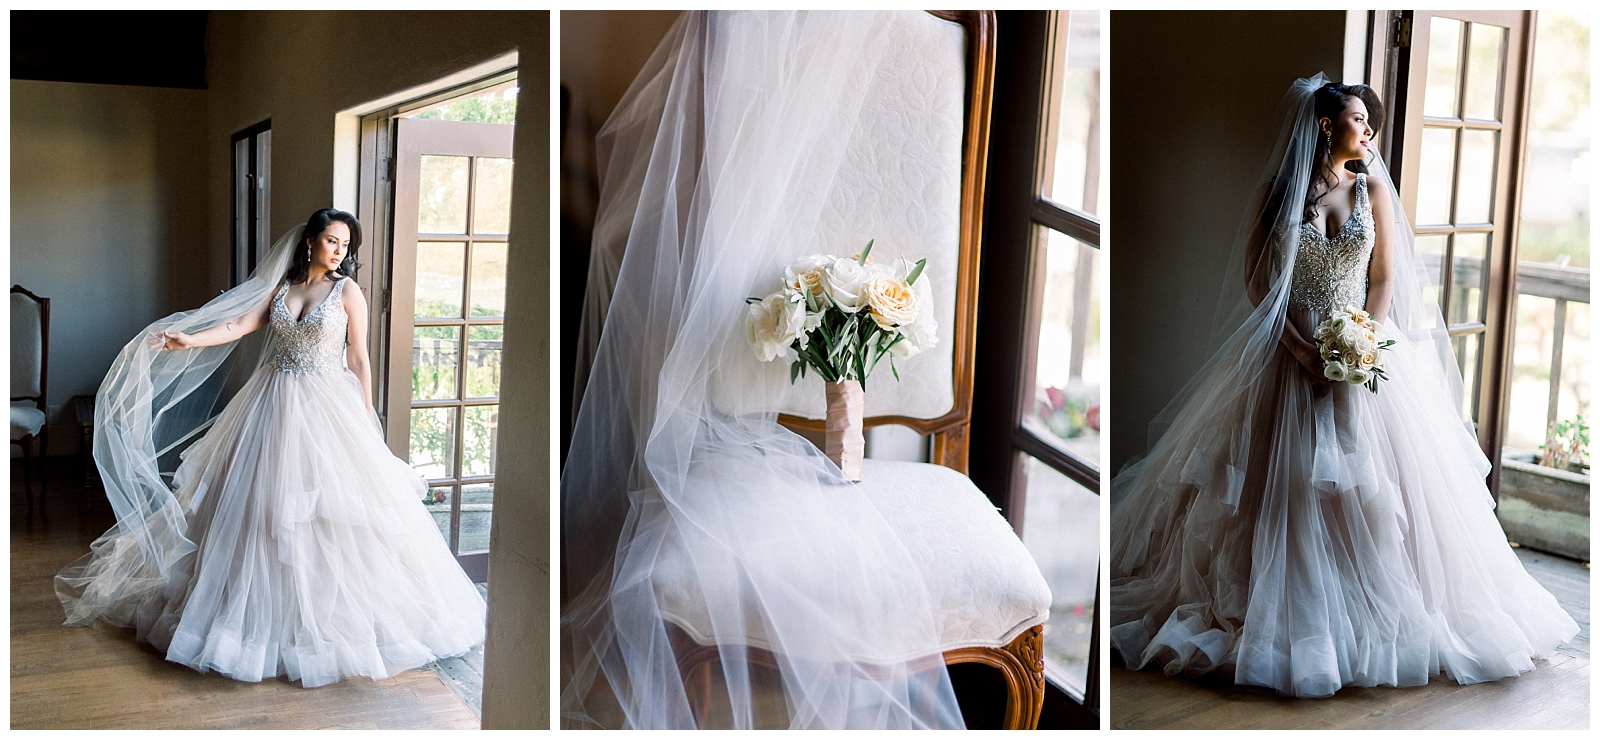 Veil-Inspiration-Epiphany-Wedding-Dress-Ballgown.jpg